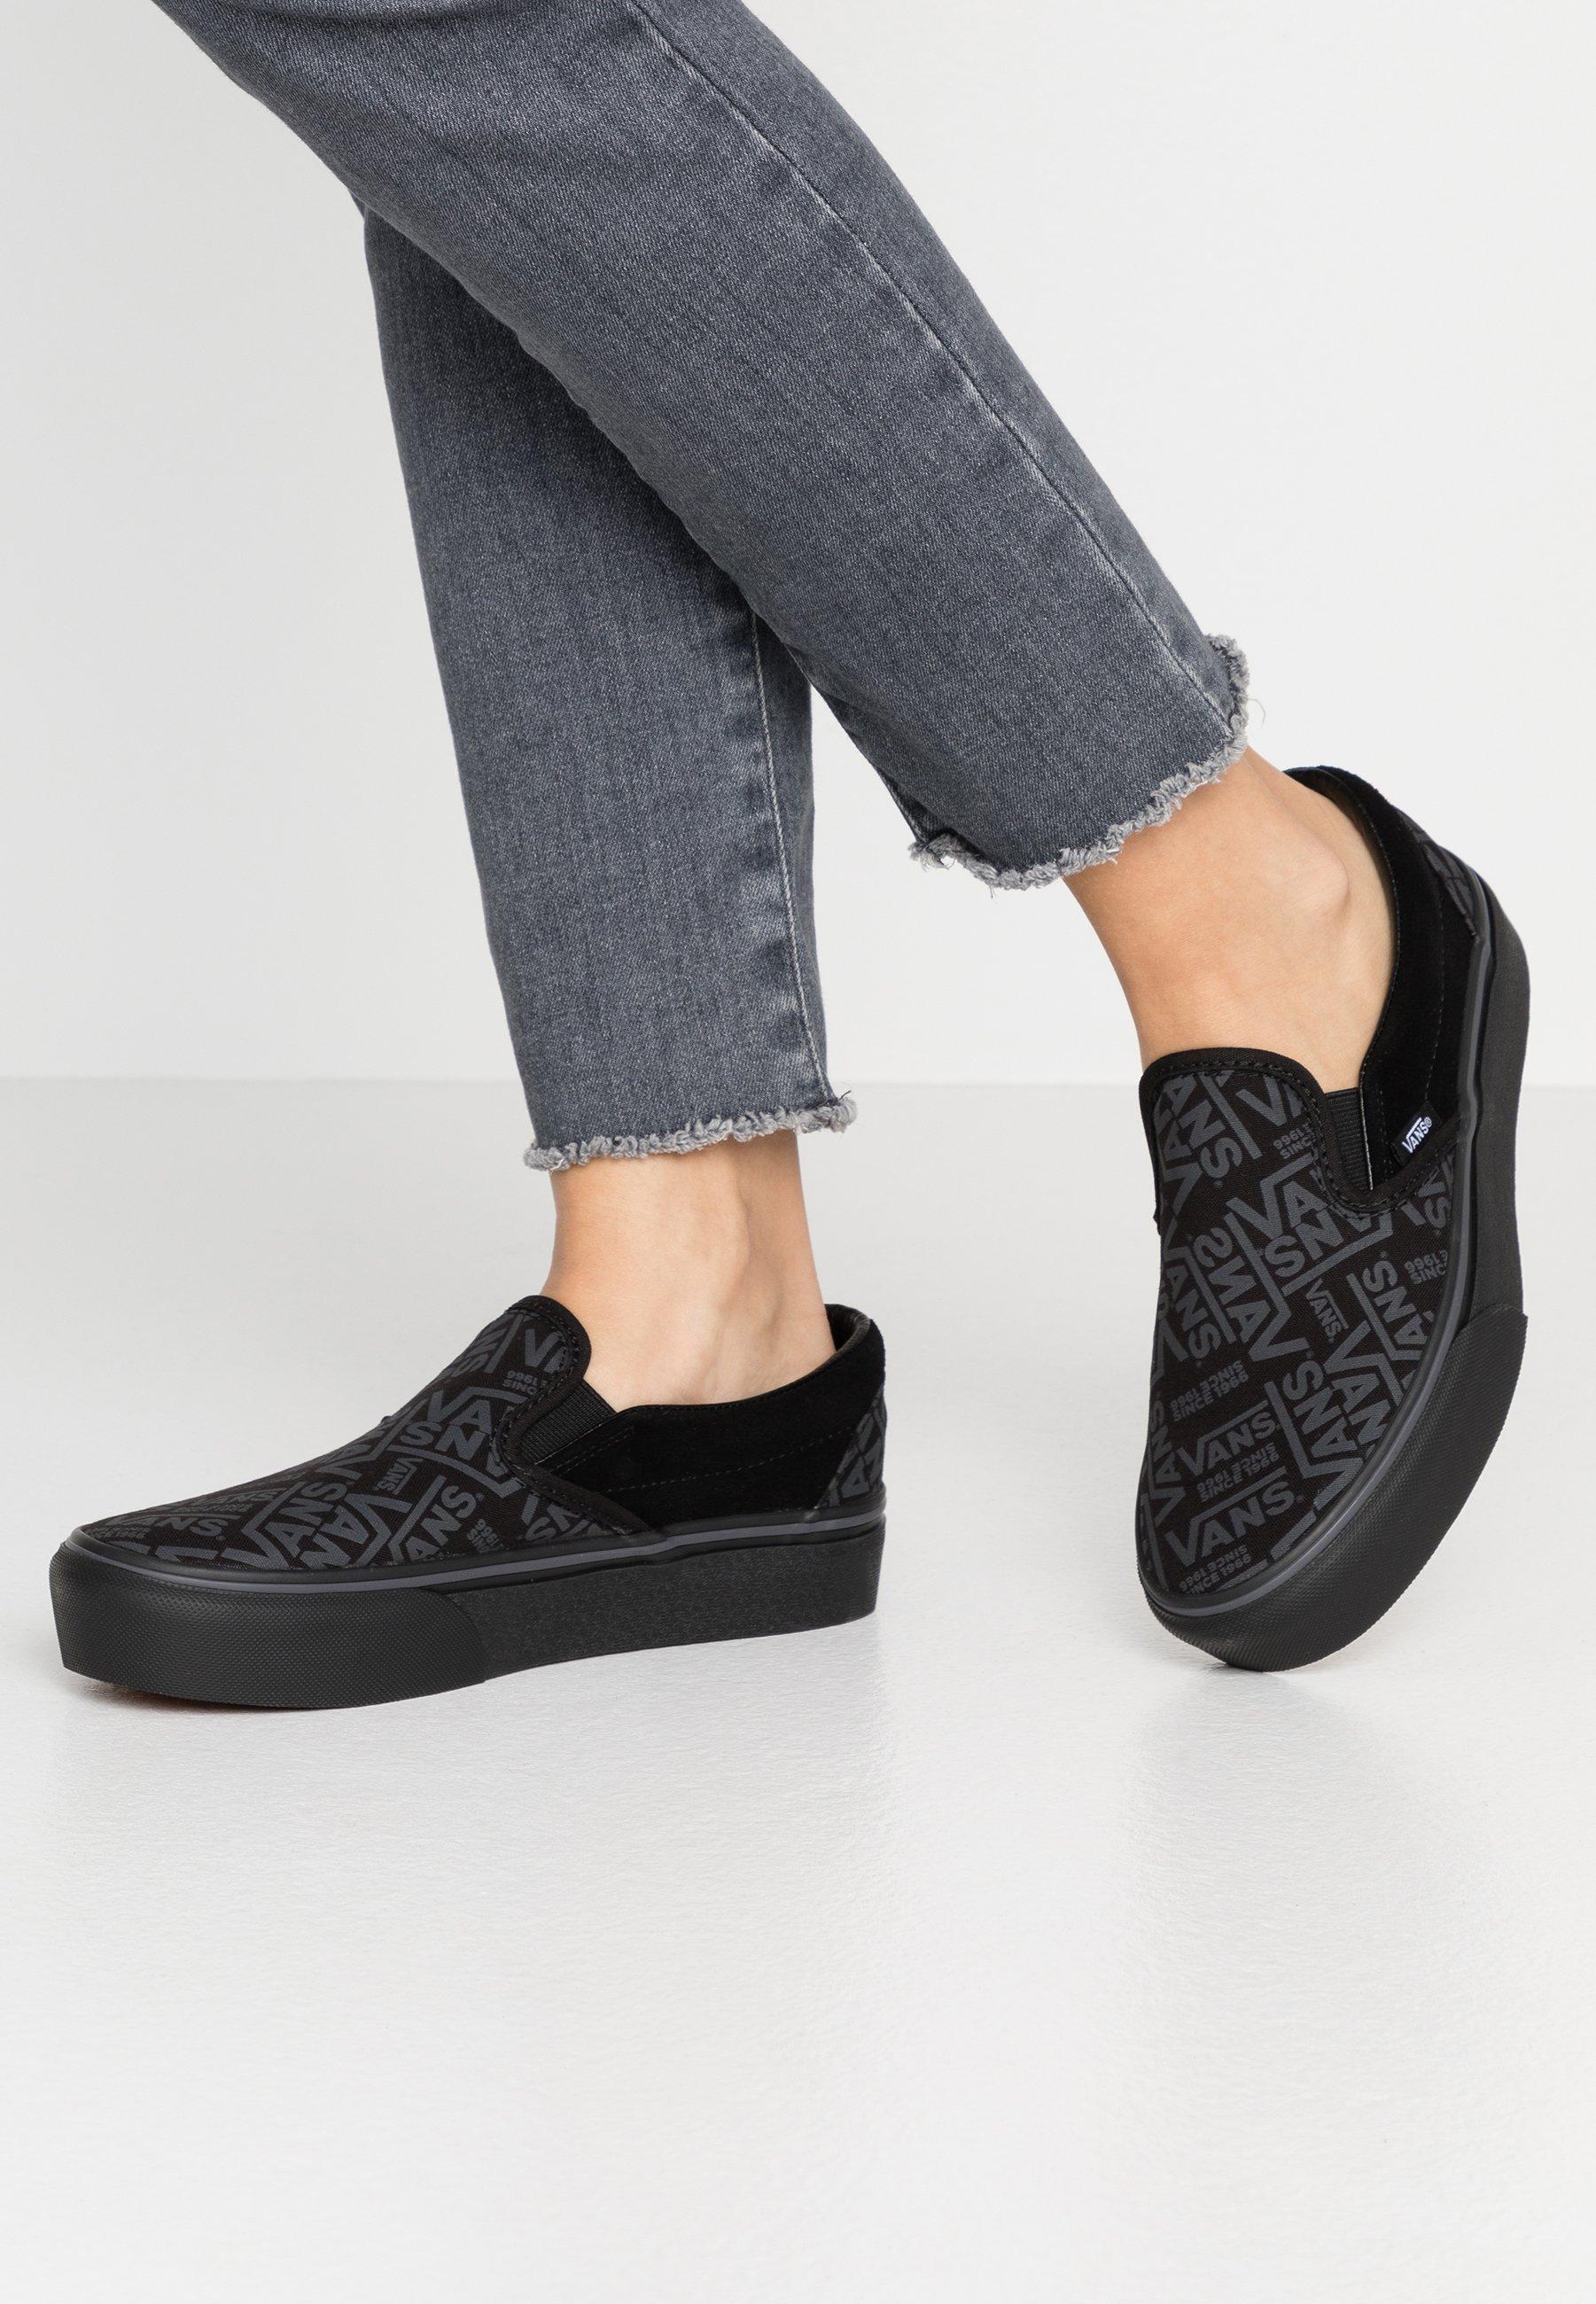 Gutes Angebot Vans CLASSIC - Slipper - black | Damenbekleidung 2020